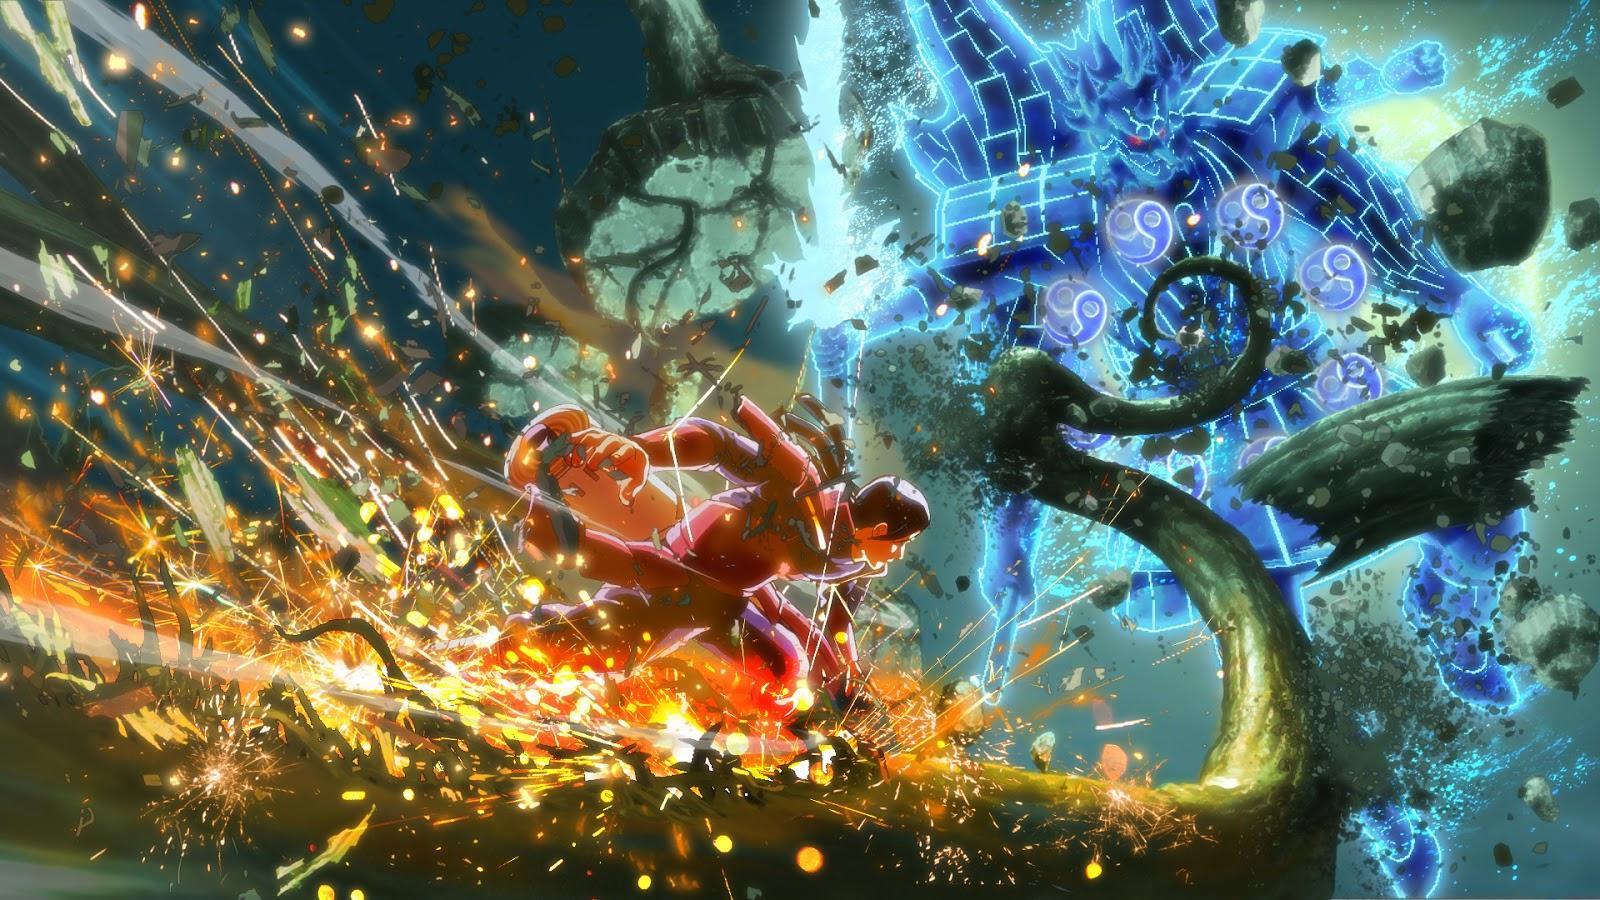 Naruto Shippuden Ultimate Ninja Storm 4 Review Drm Gamecast